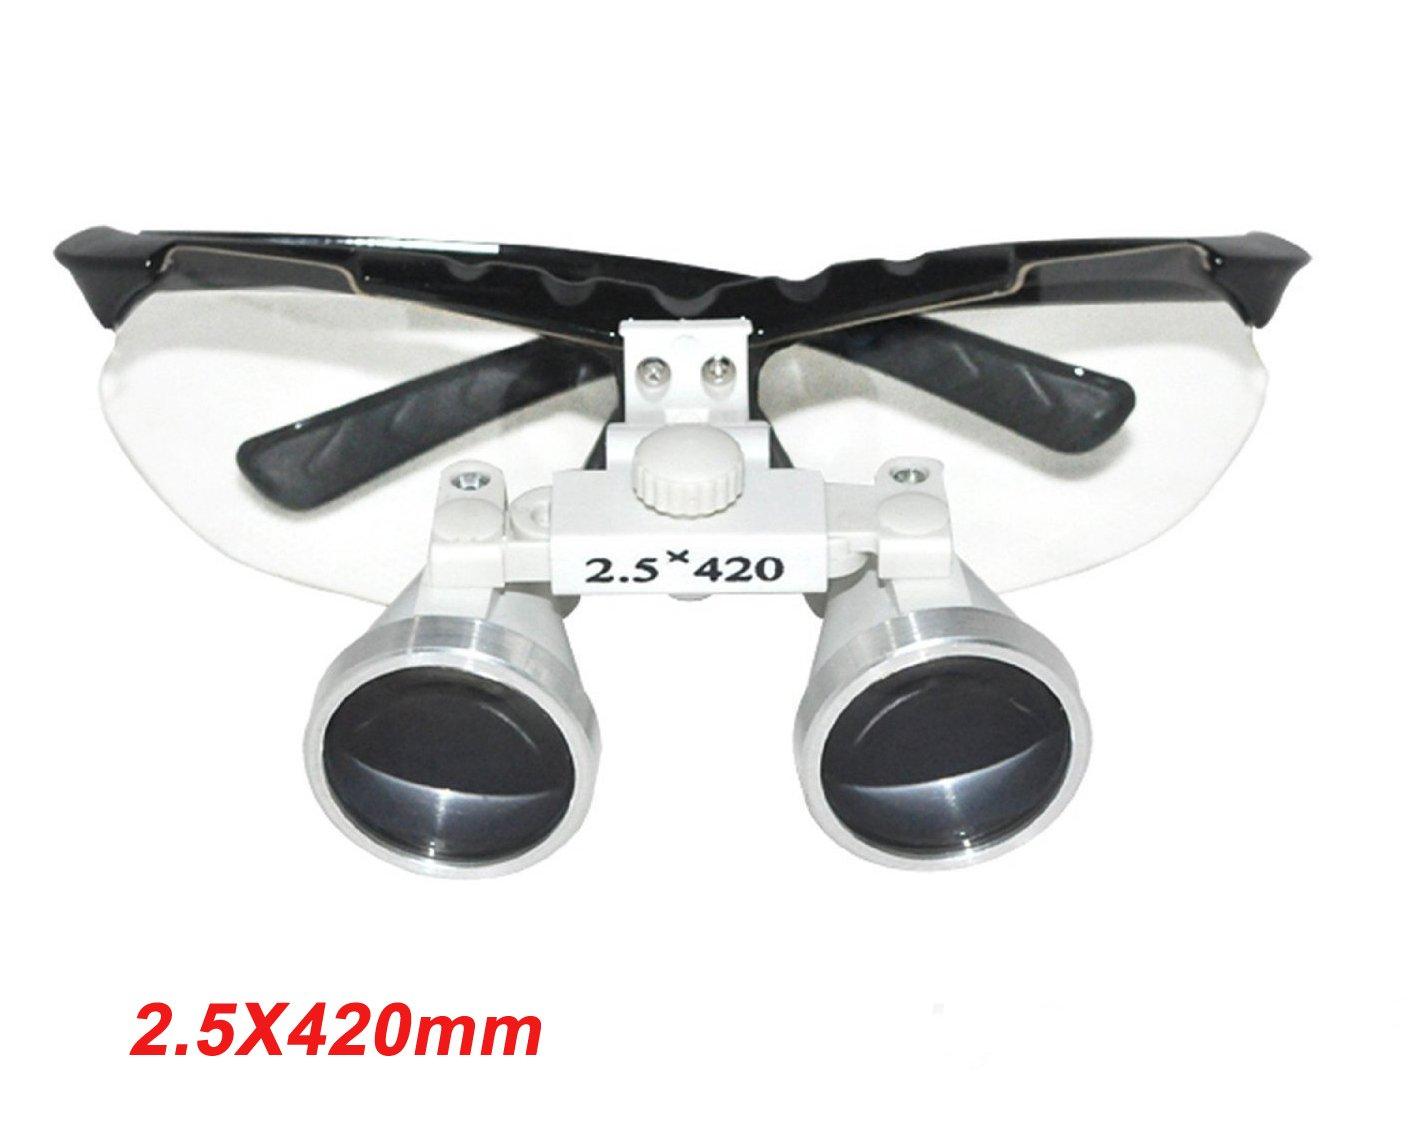 Zinnor (FBA) Dentist Dental Surgical Medical Binocular Loupes 2.5X 420mm Optical Glass Loupe - Black